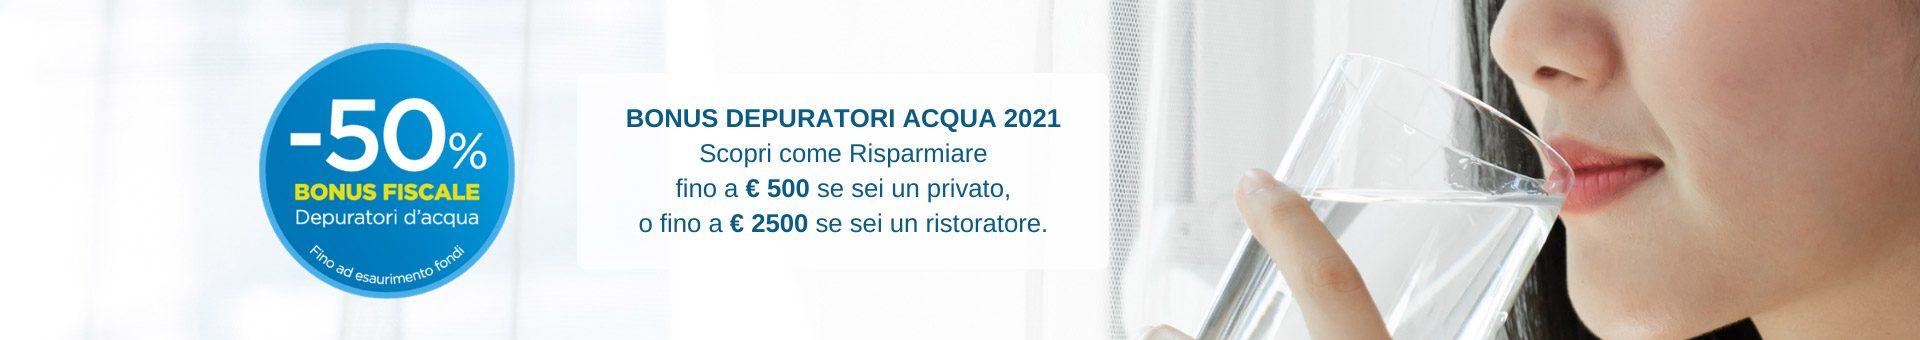 Bonus-Depuratori-Acqua-2021-IDRONORD-MAISTER-banner-5